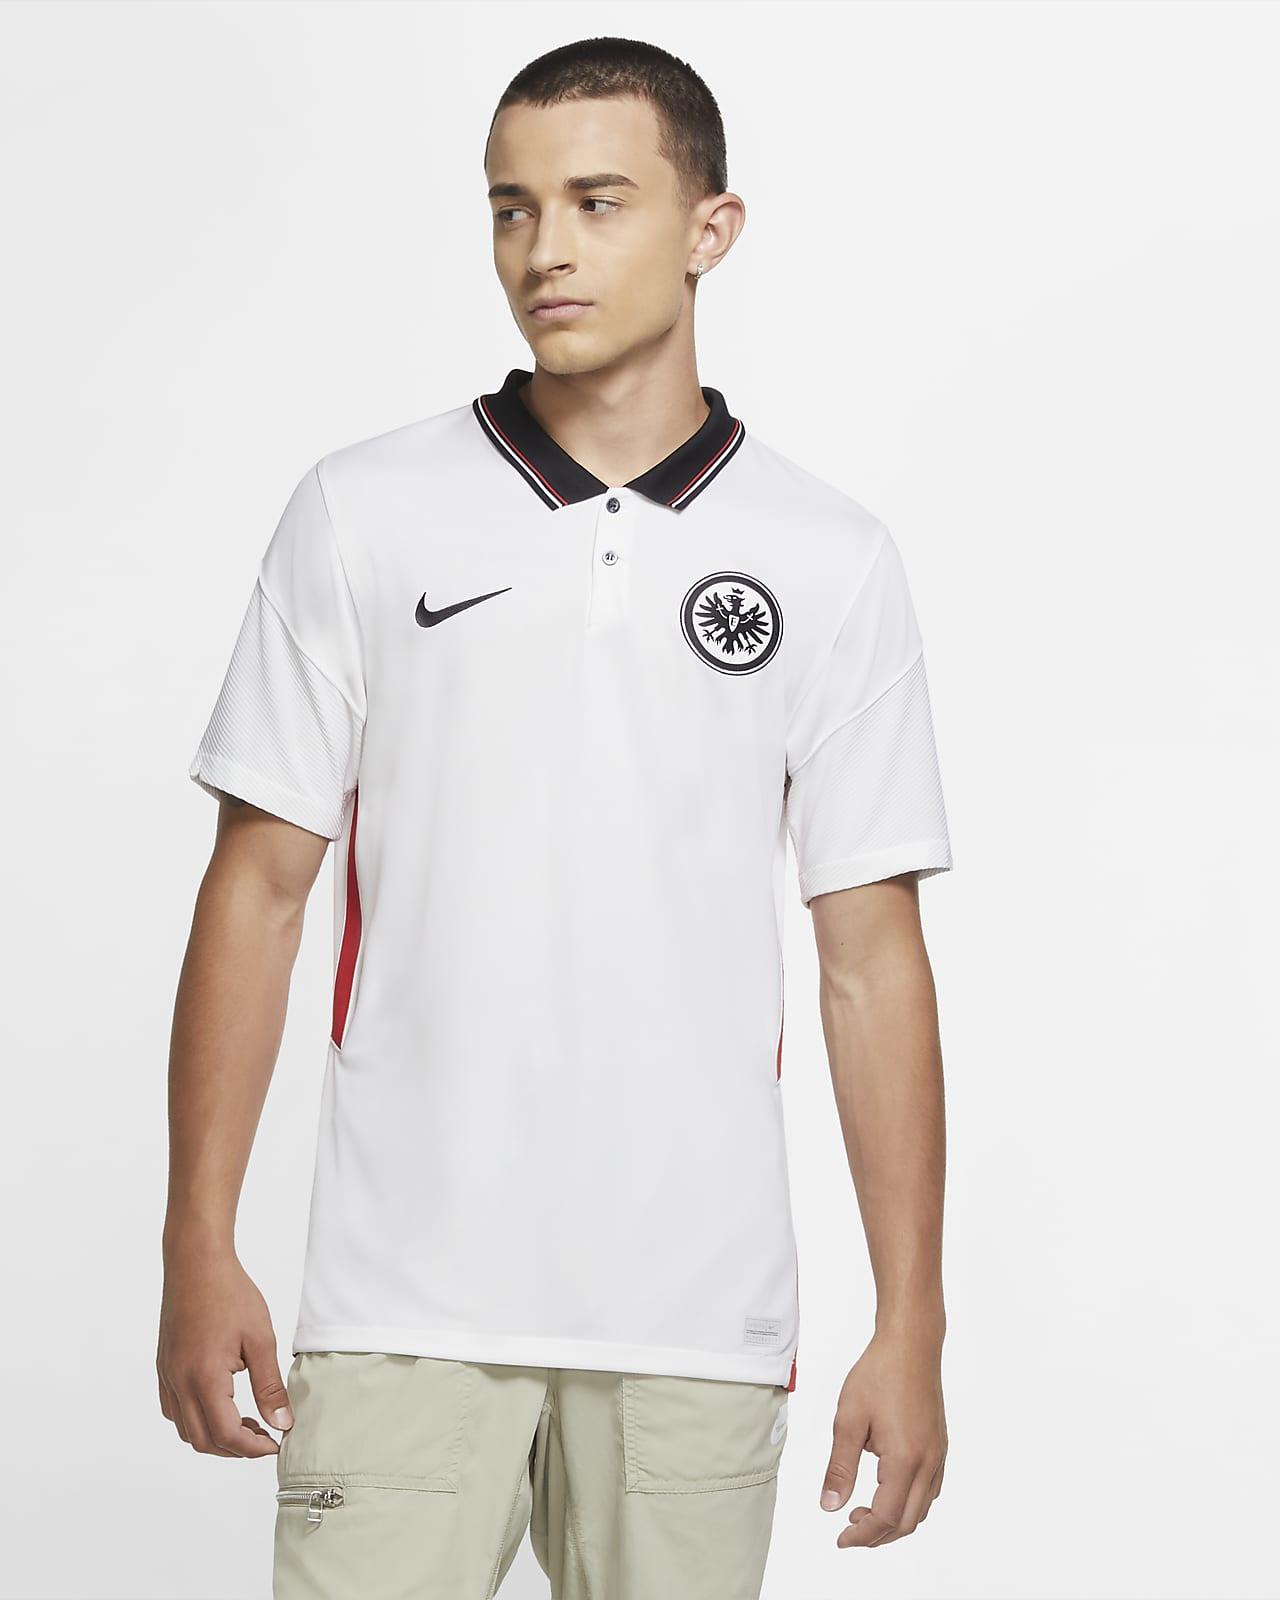 Eintracht Frankfurt 2020/21 Stadium Away Men's Football Shirt